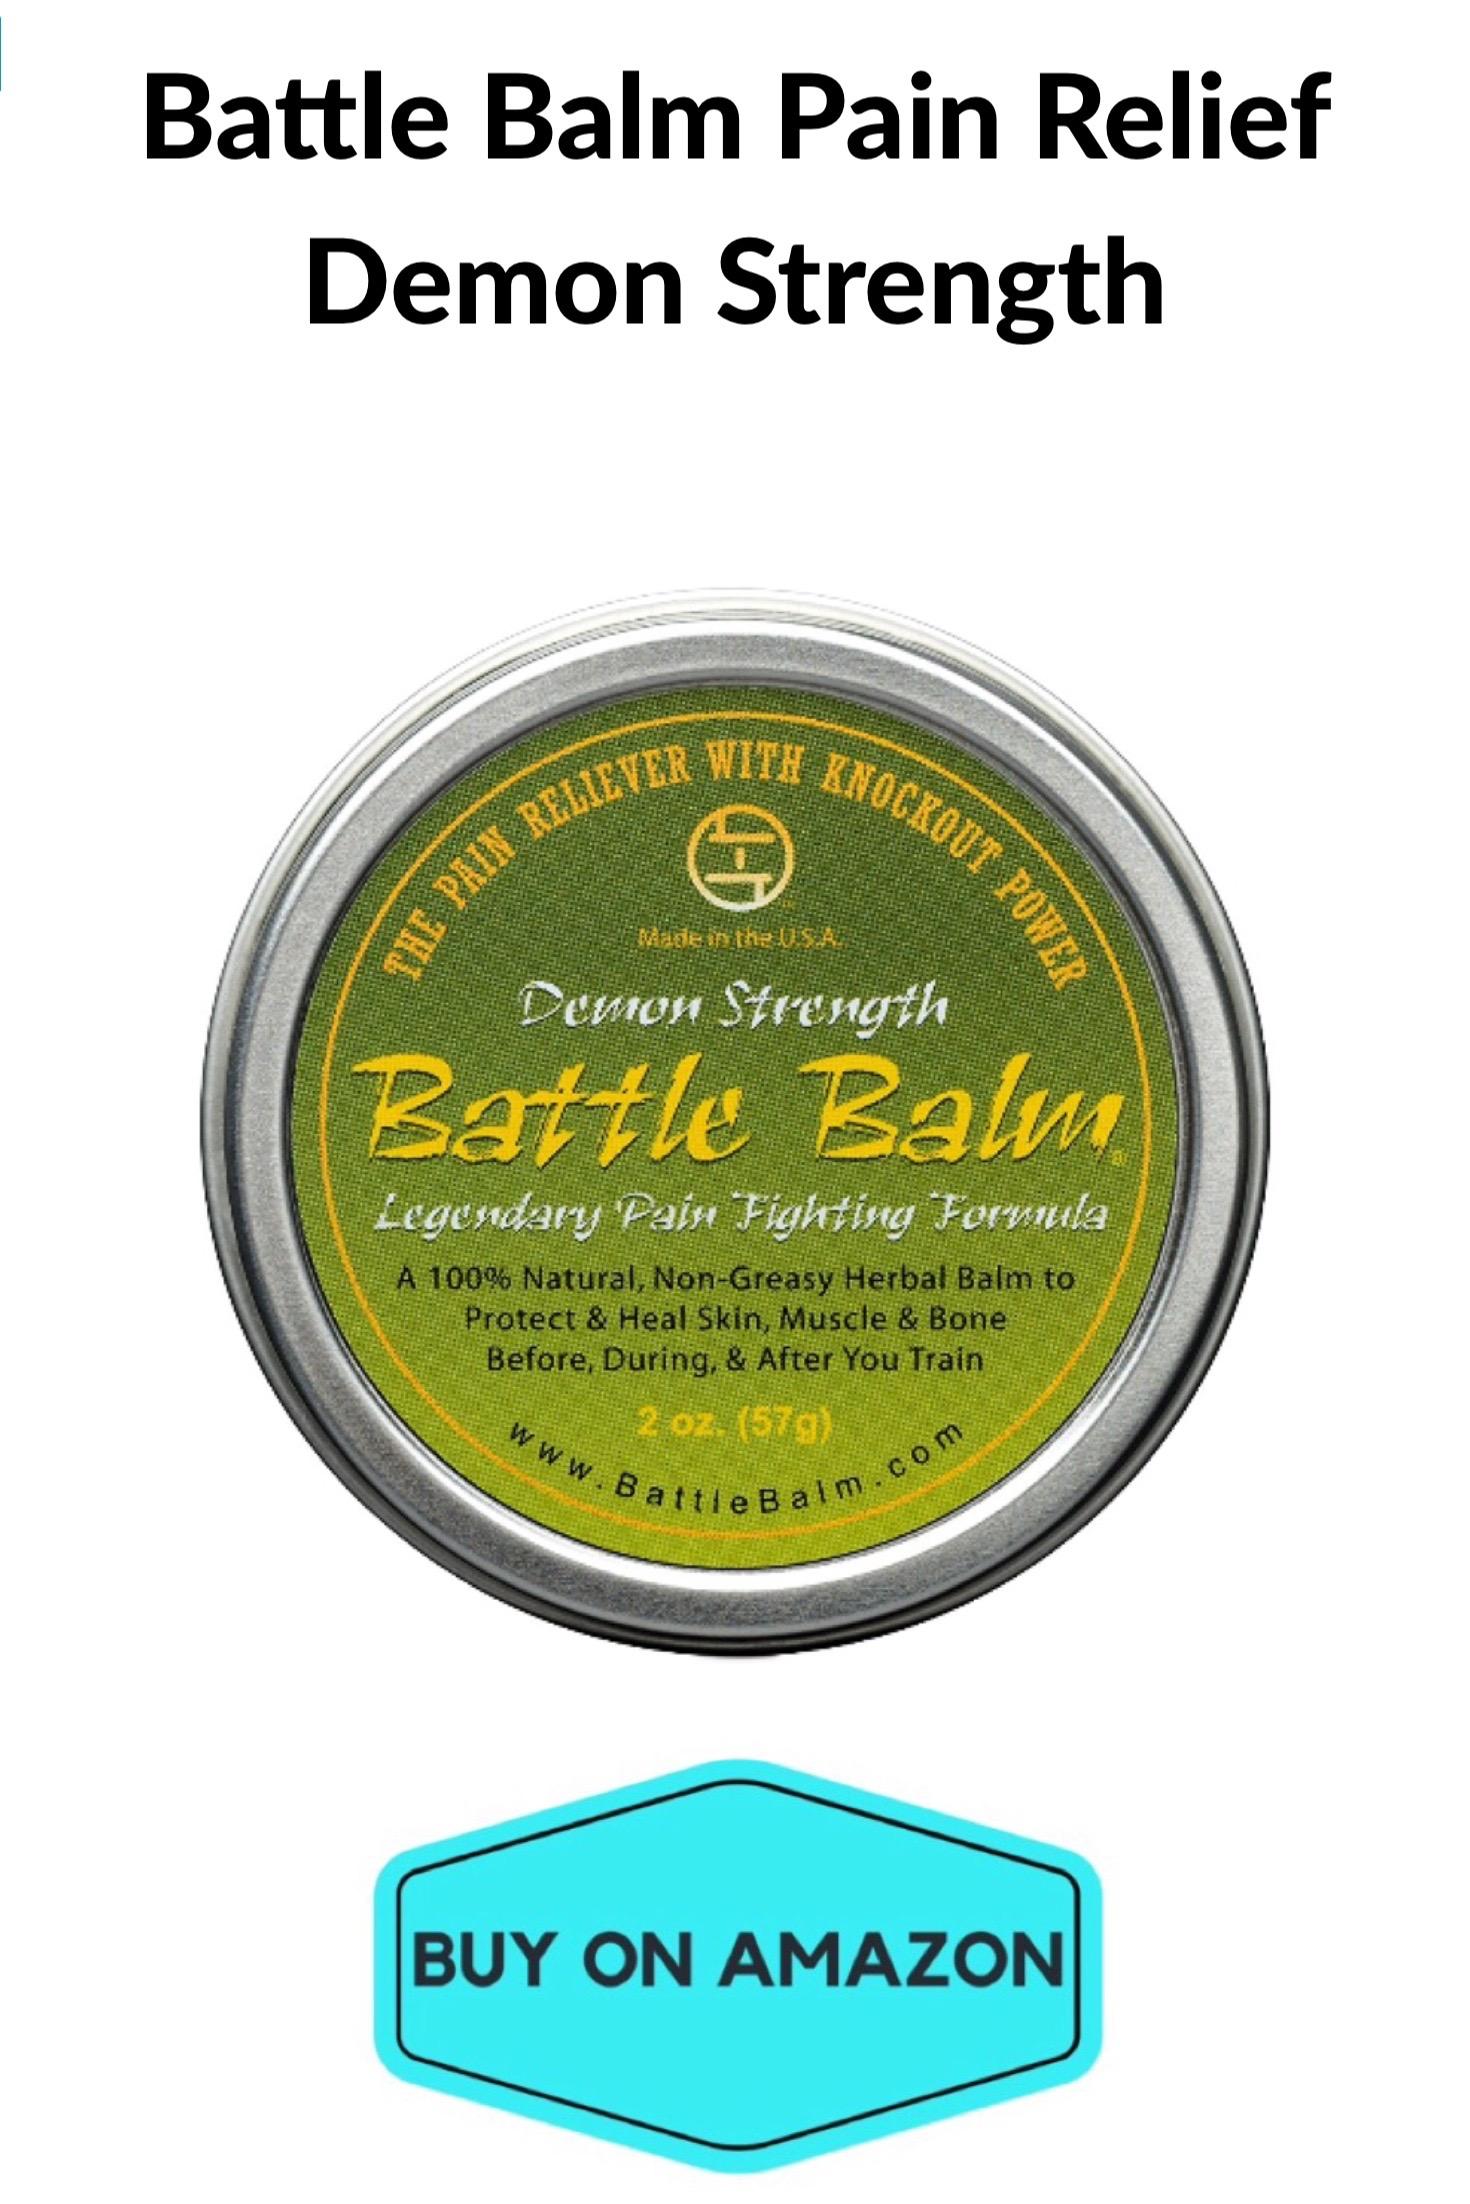 Battle Balm Pain Relief Demon Strength